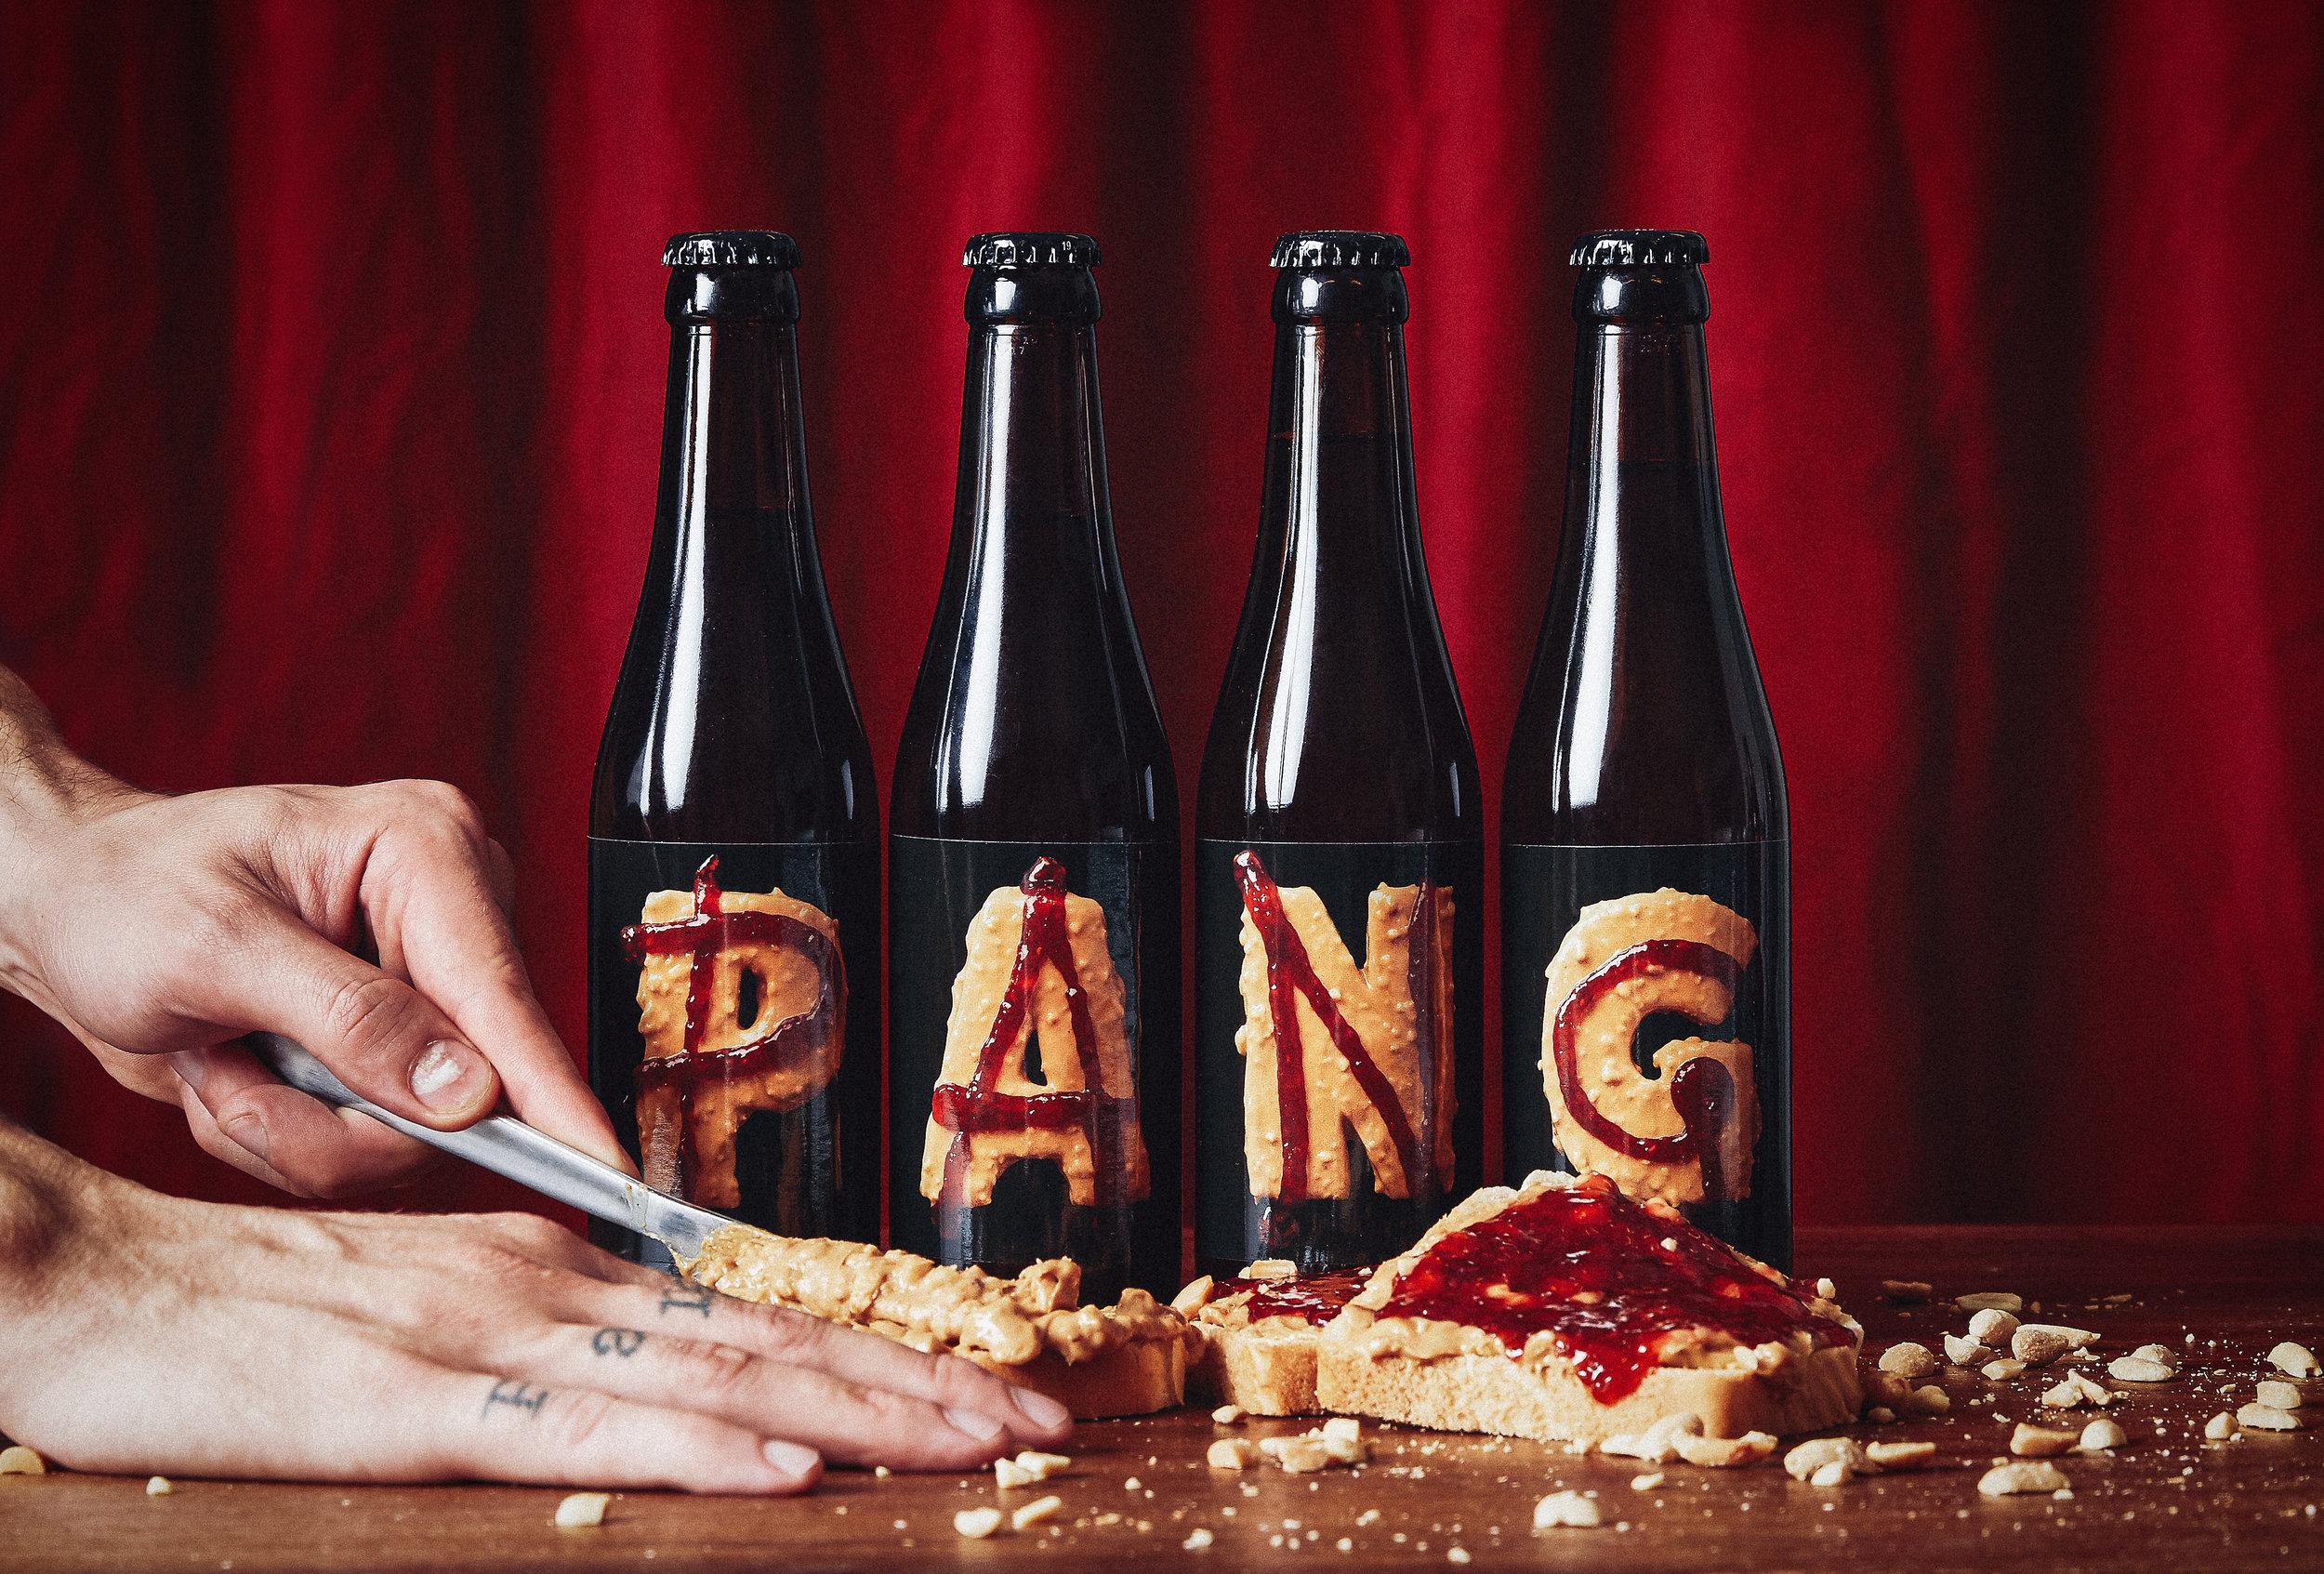 pangpang_nuts_bottles.jpg